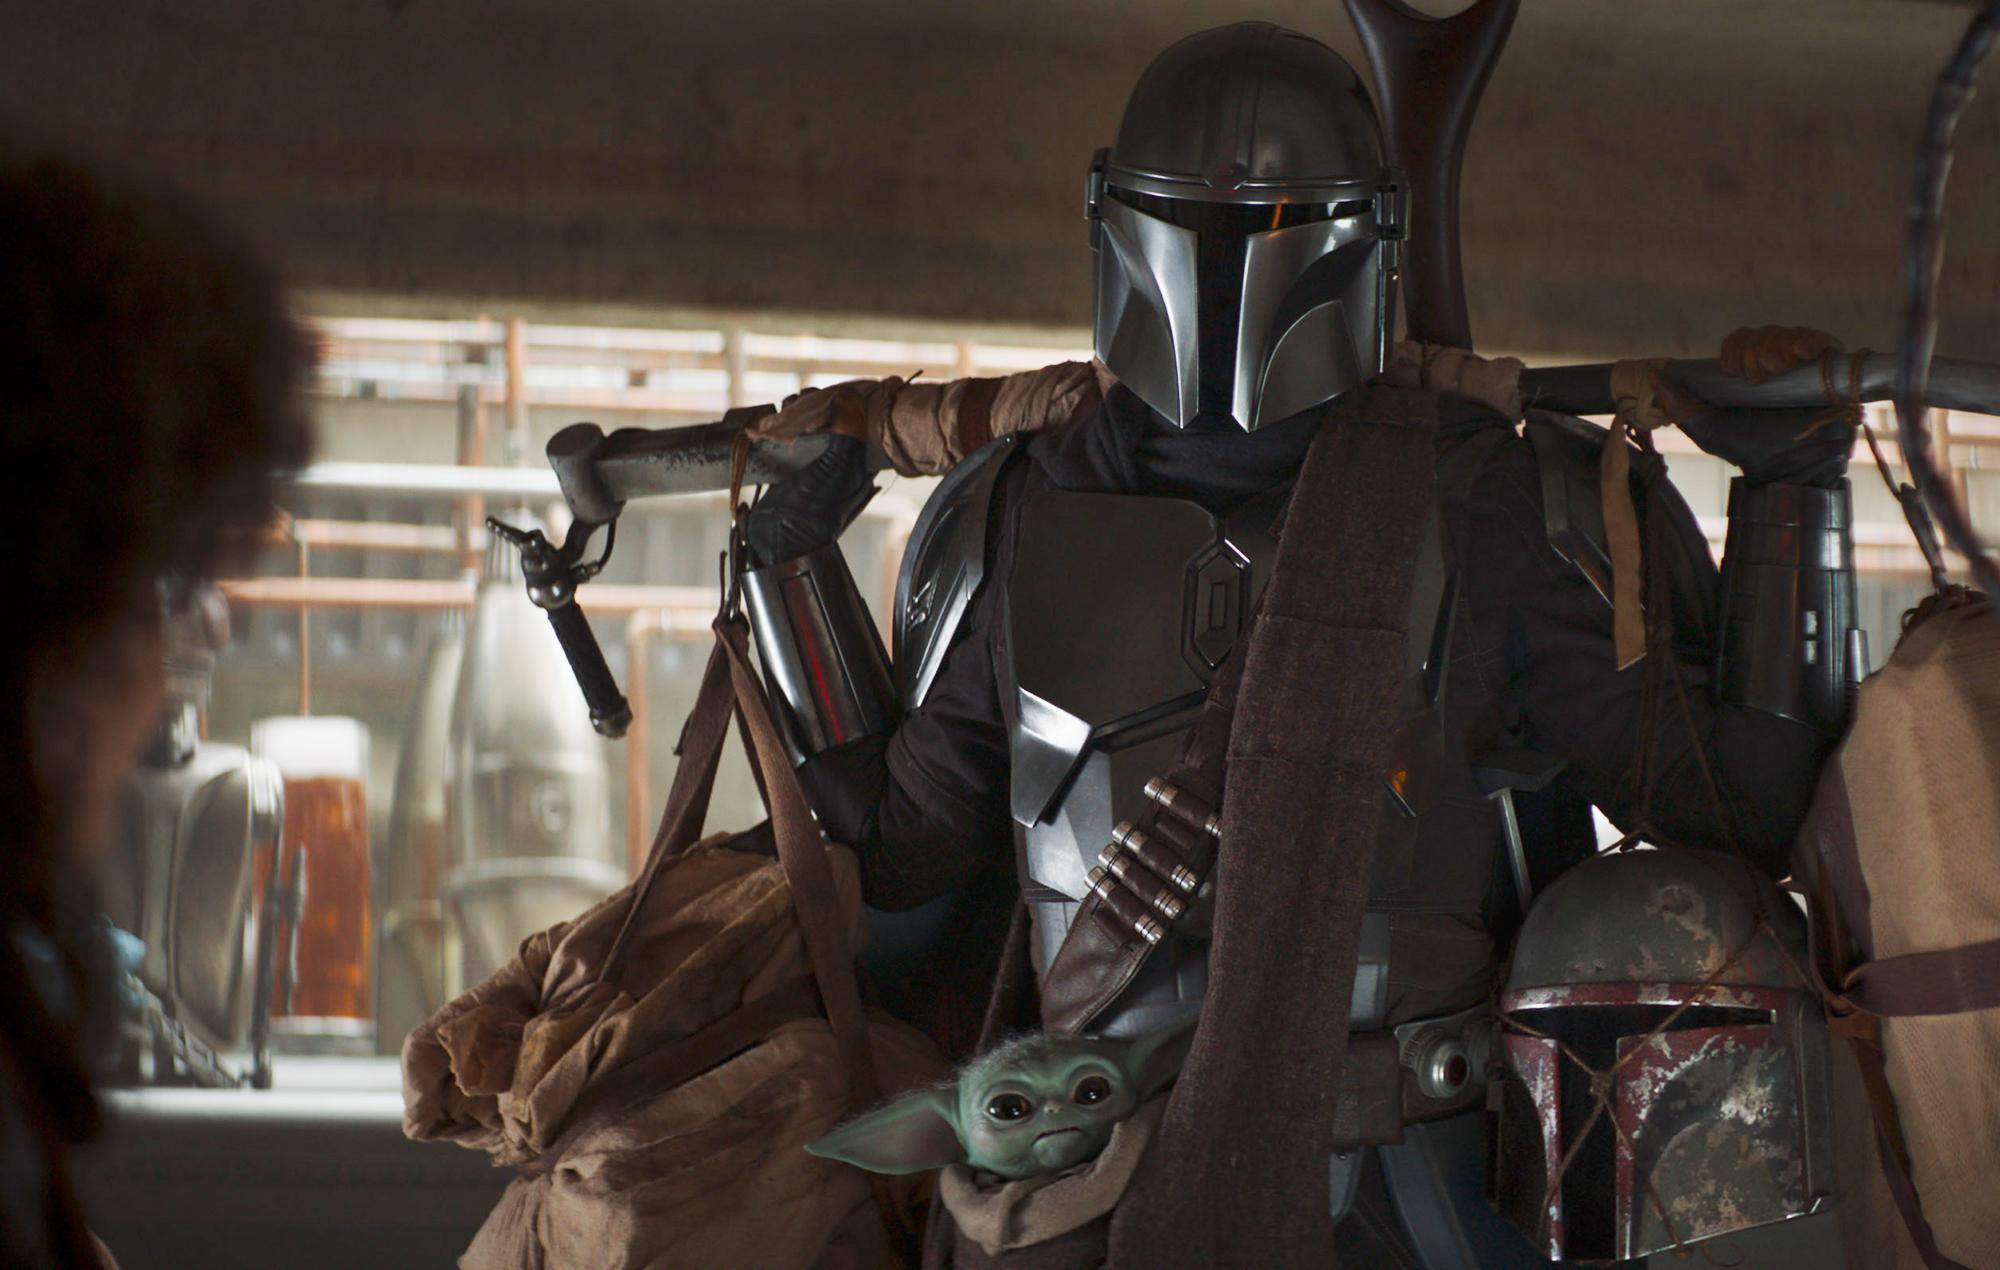 The Mandalorian Season 2 Episode 2 Star Wars Meets Arachnophobia